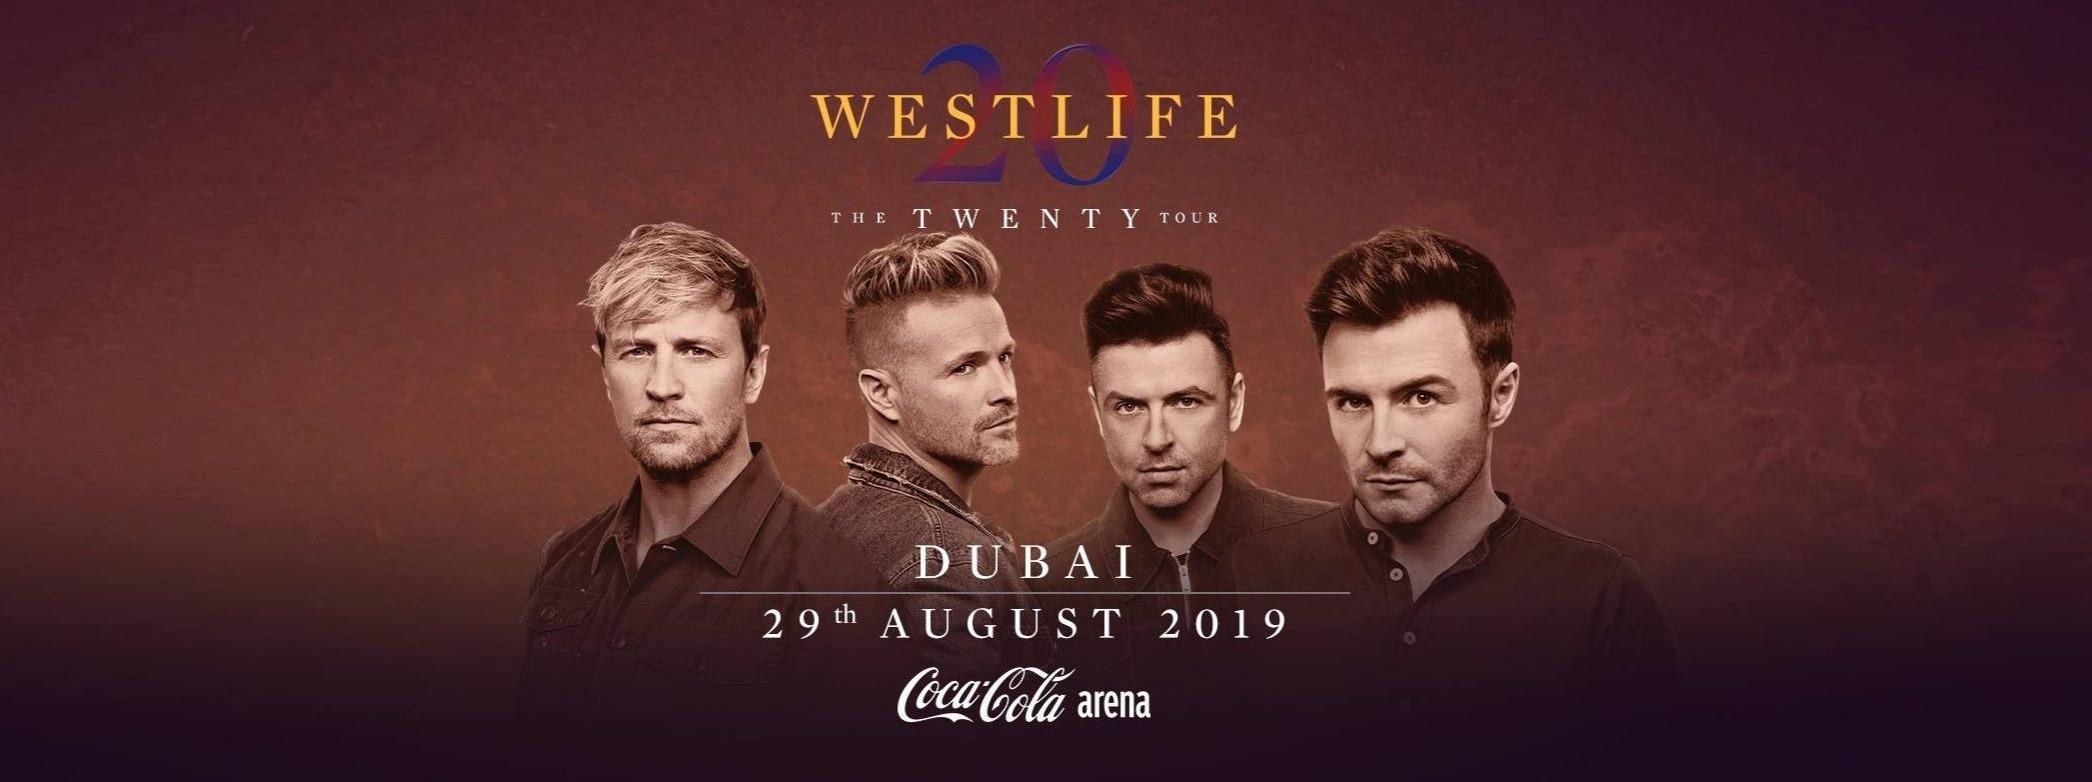 Westlife at Coca-Cola Arena - Coming Soon in UAE